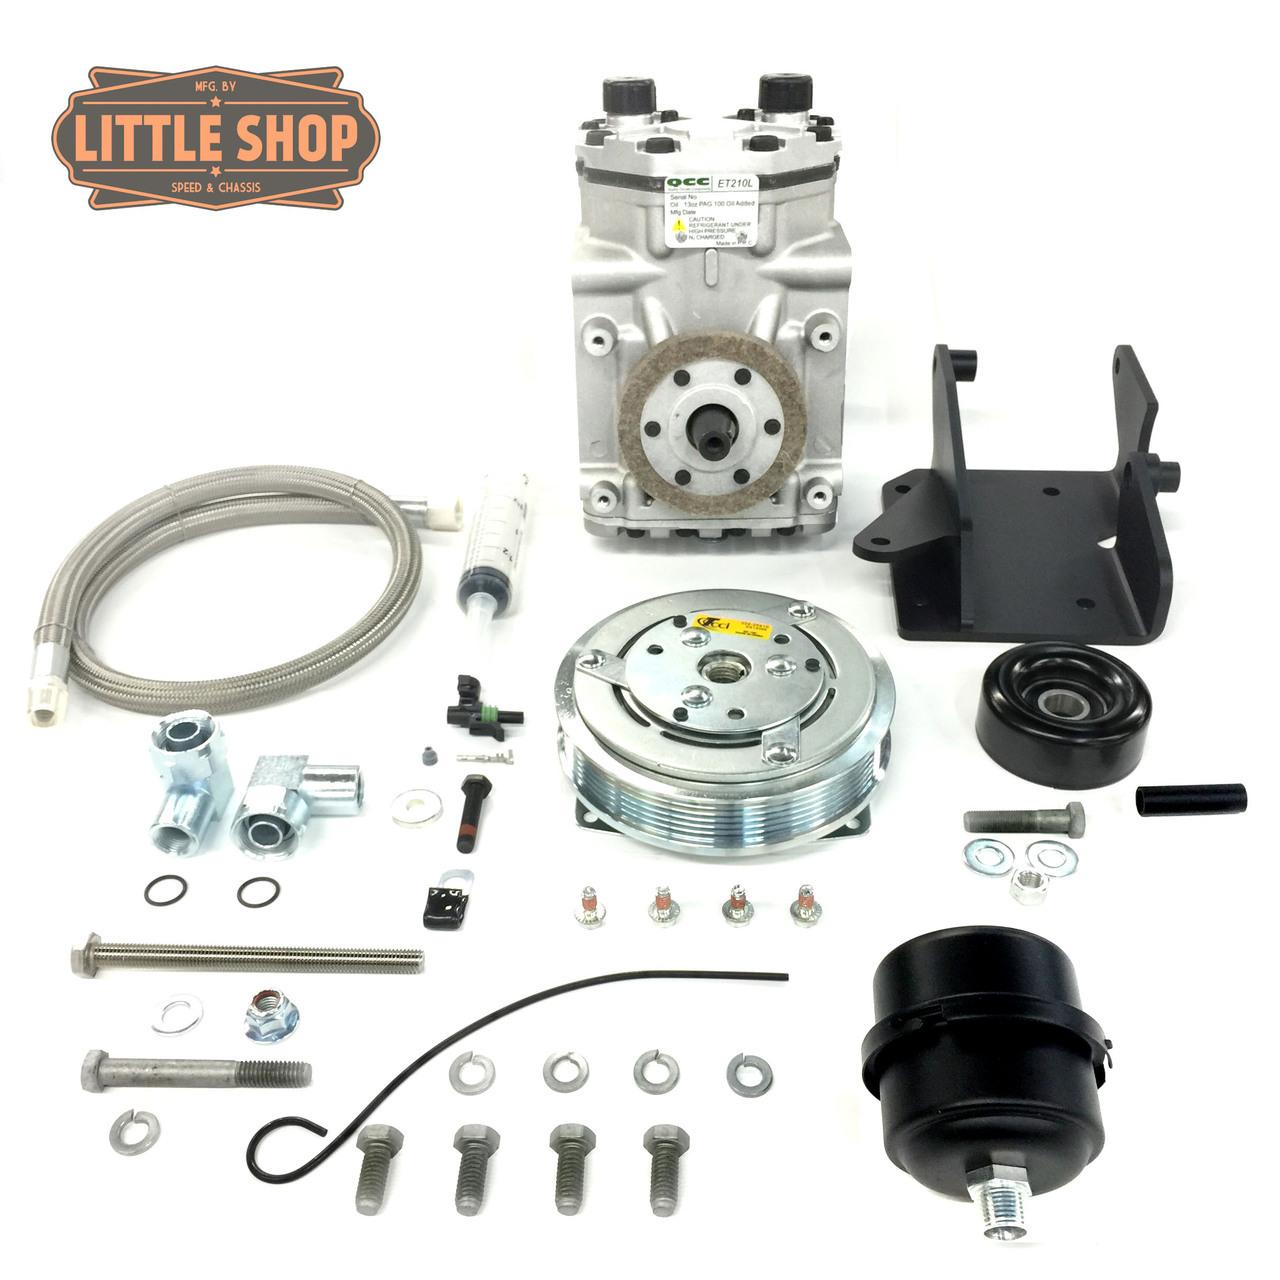 LSMFG-Pre V-EDC 90'-95' GM 4.3, 5.0, 5.7 Pre-Vortec Engine Driven Compressor Kit